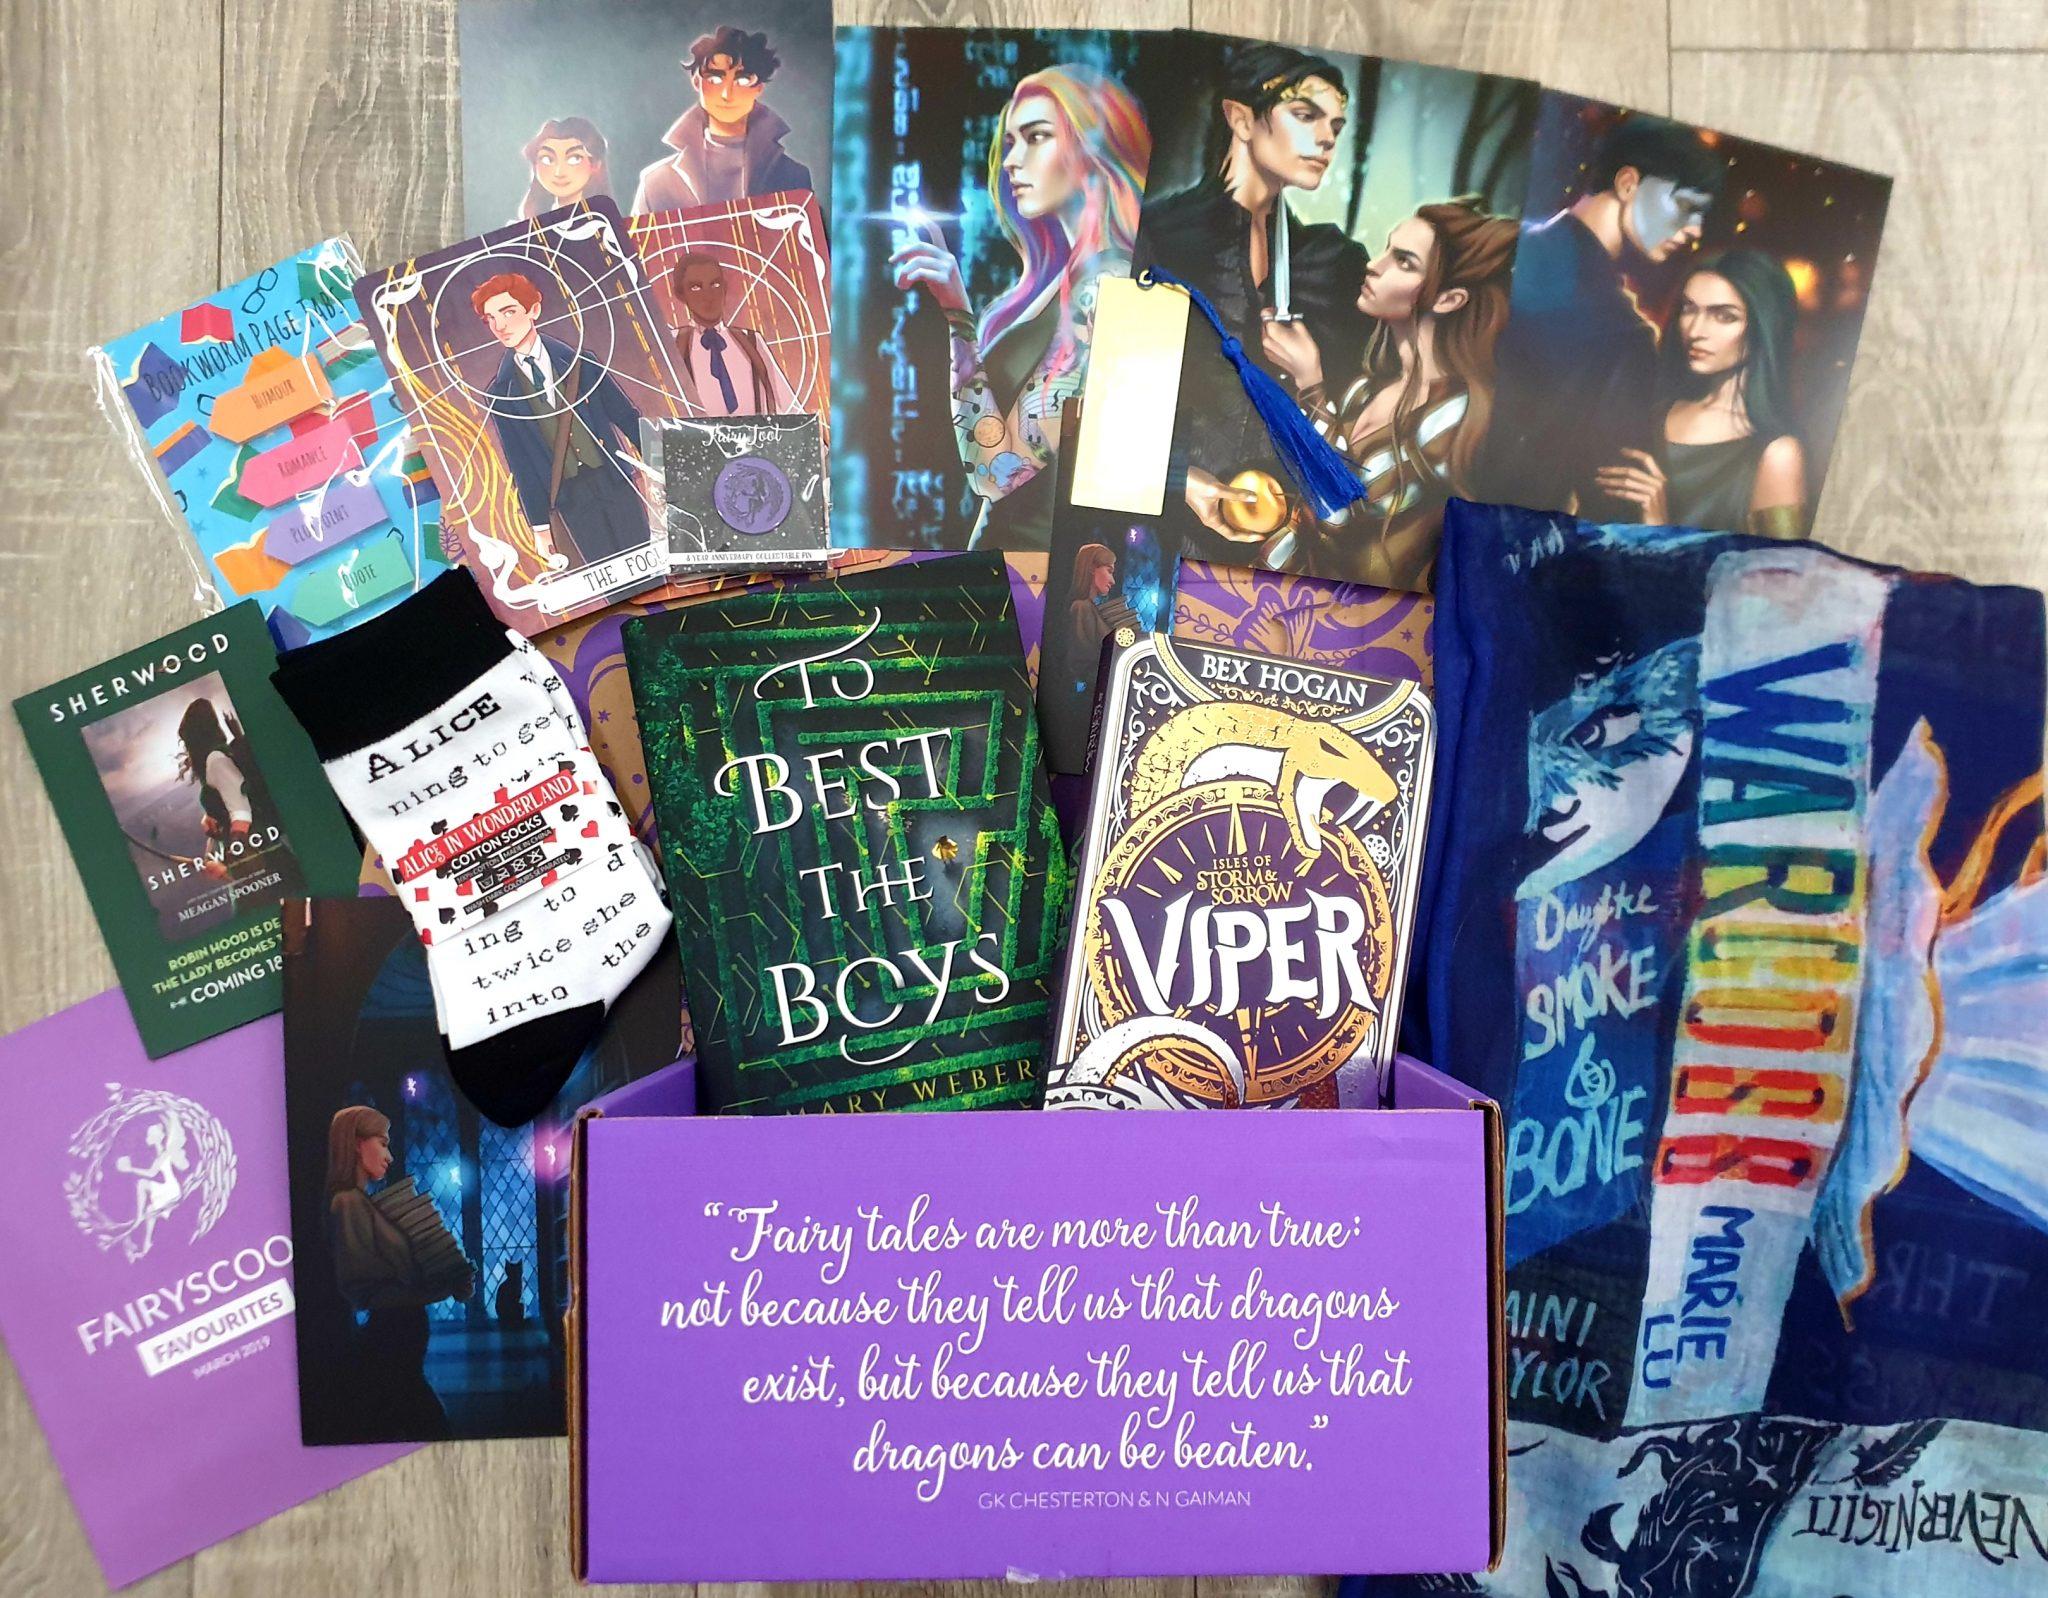 FairyLoot March 3 Year Anniversary Box